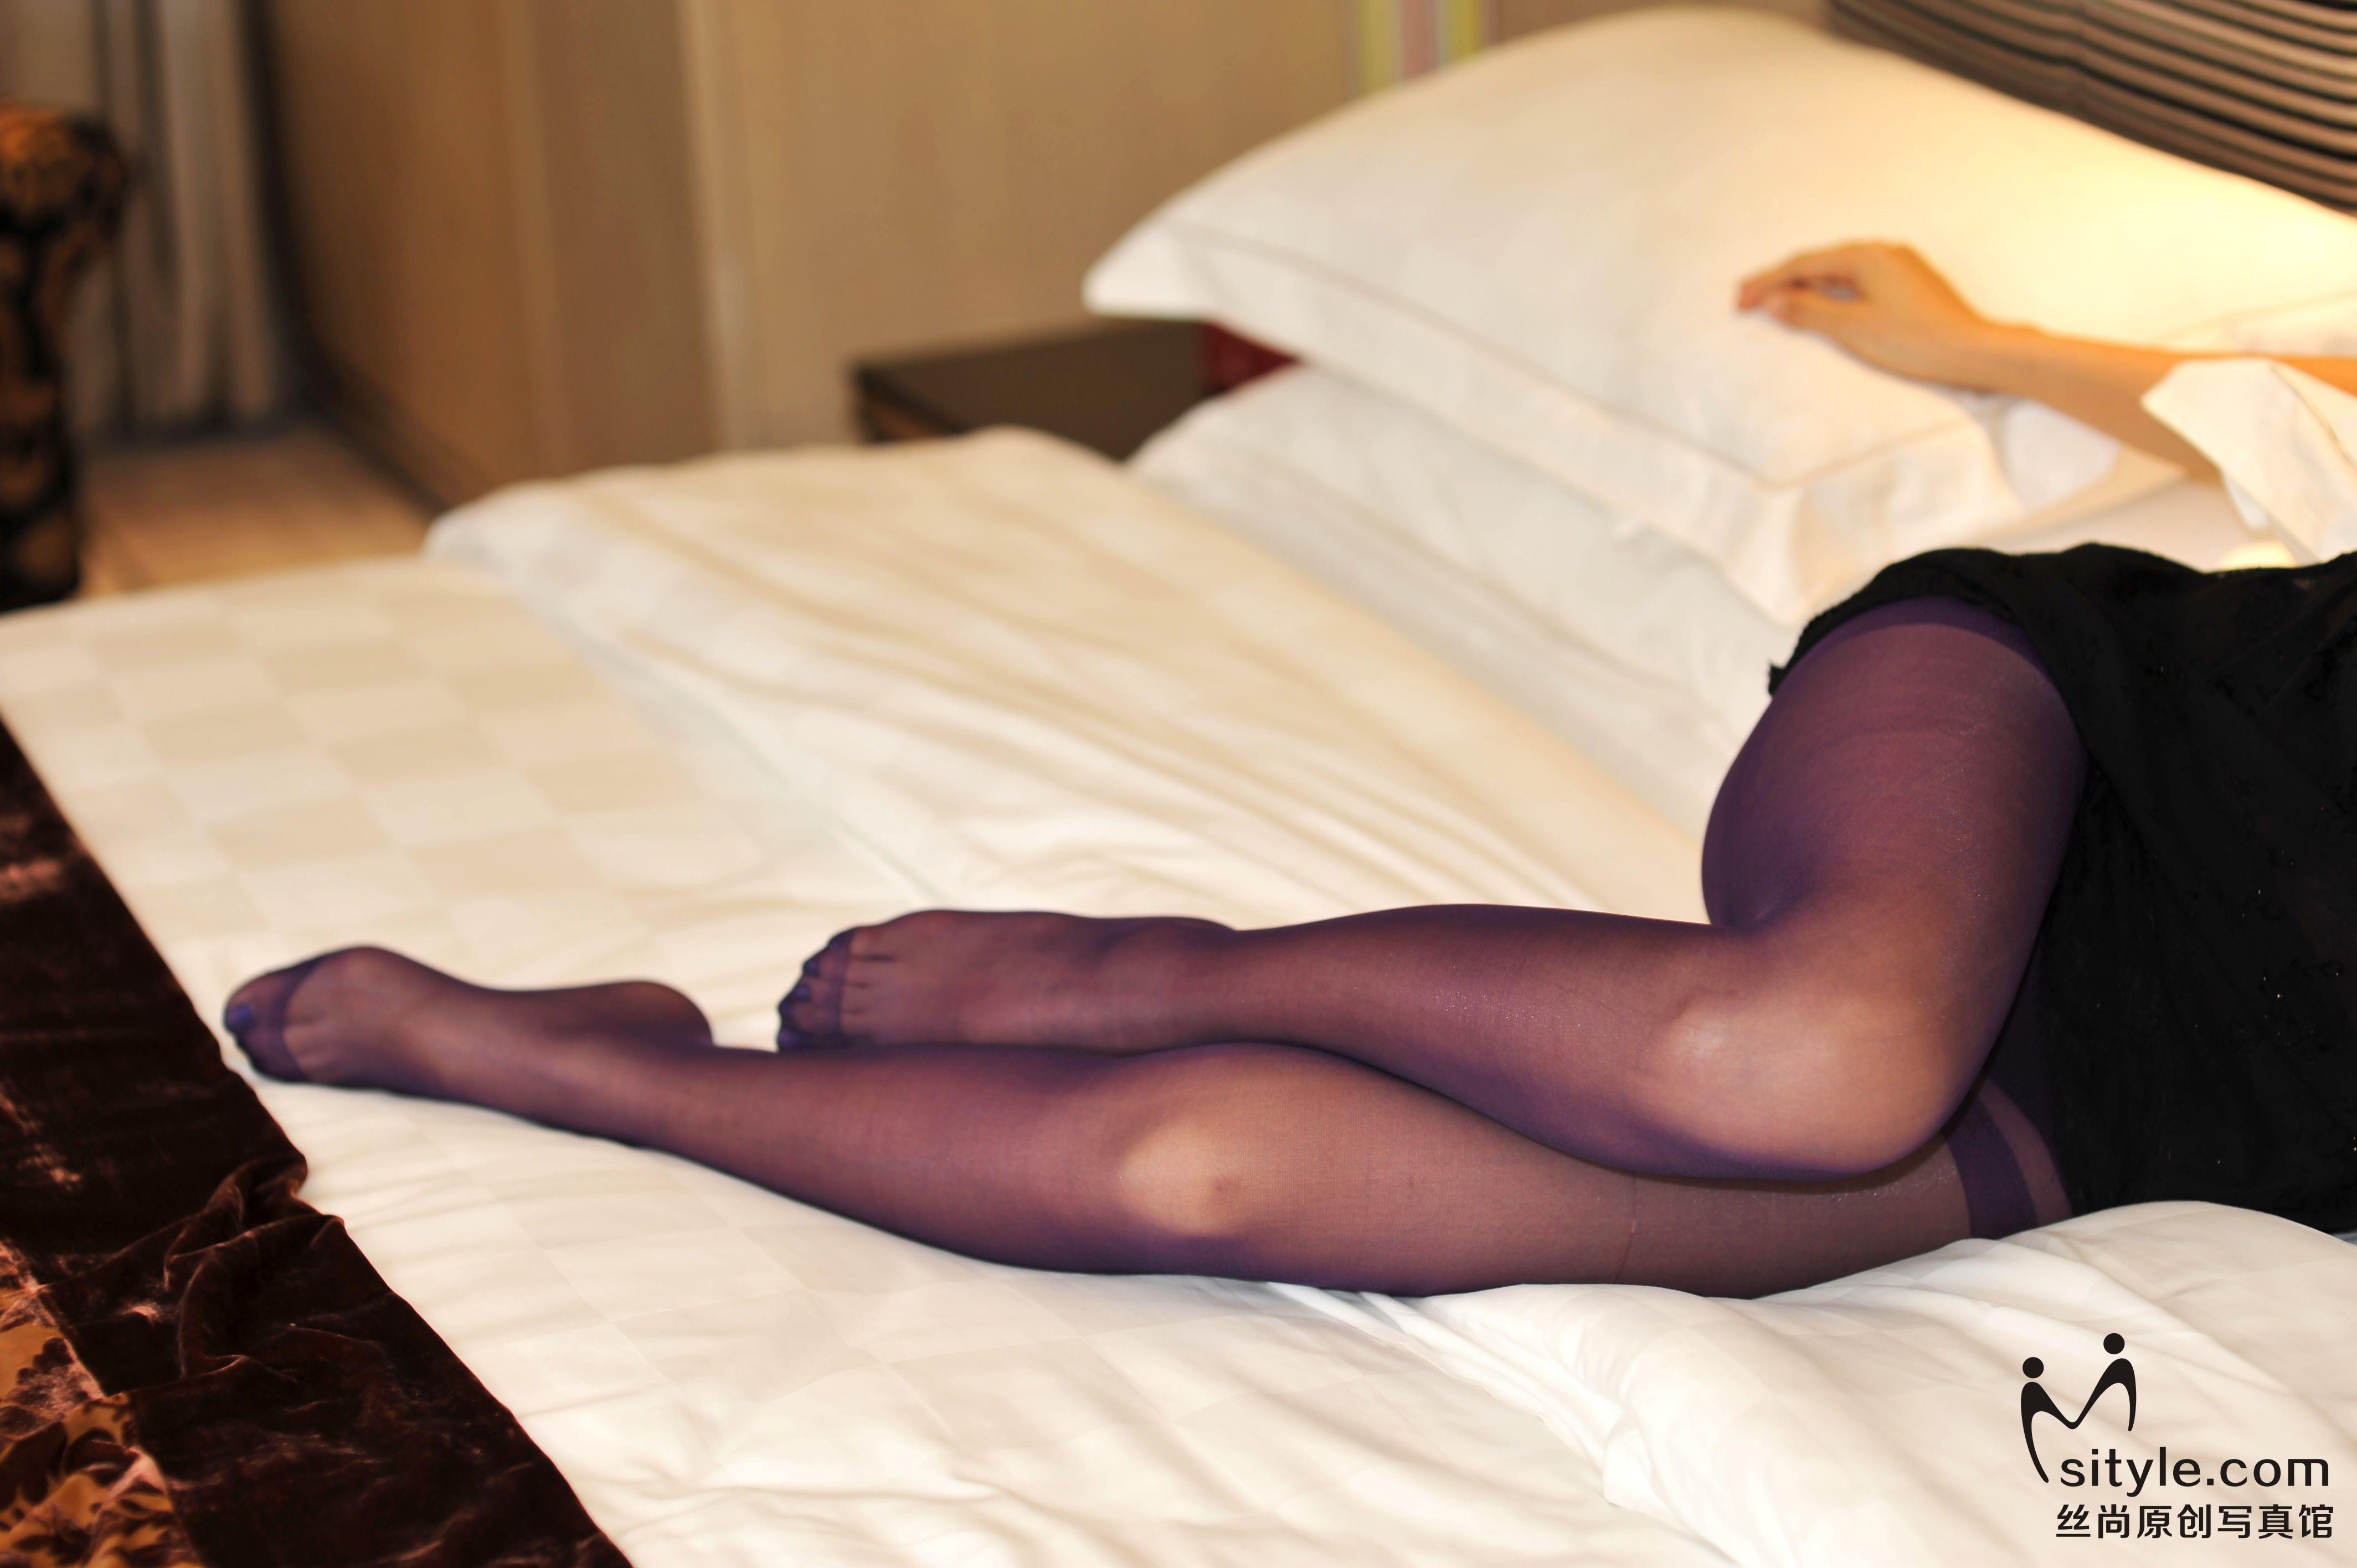 [Sityle丝尚写真]NO.007 黑色透视连身裙美女紫色丝袜美腿性感私房写真集,